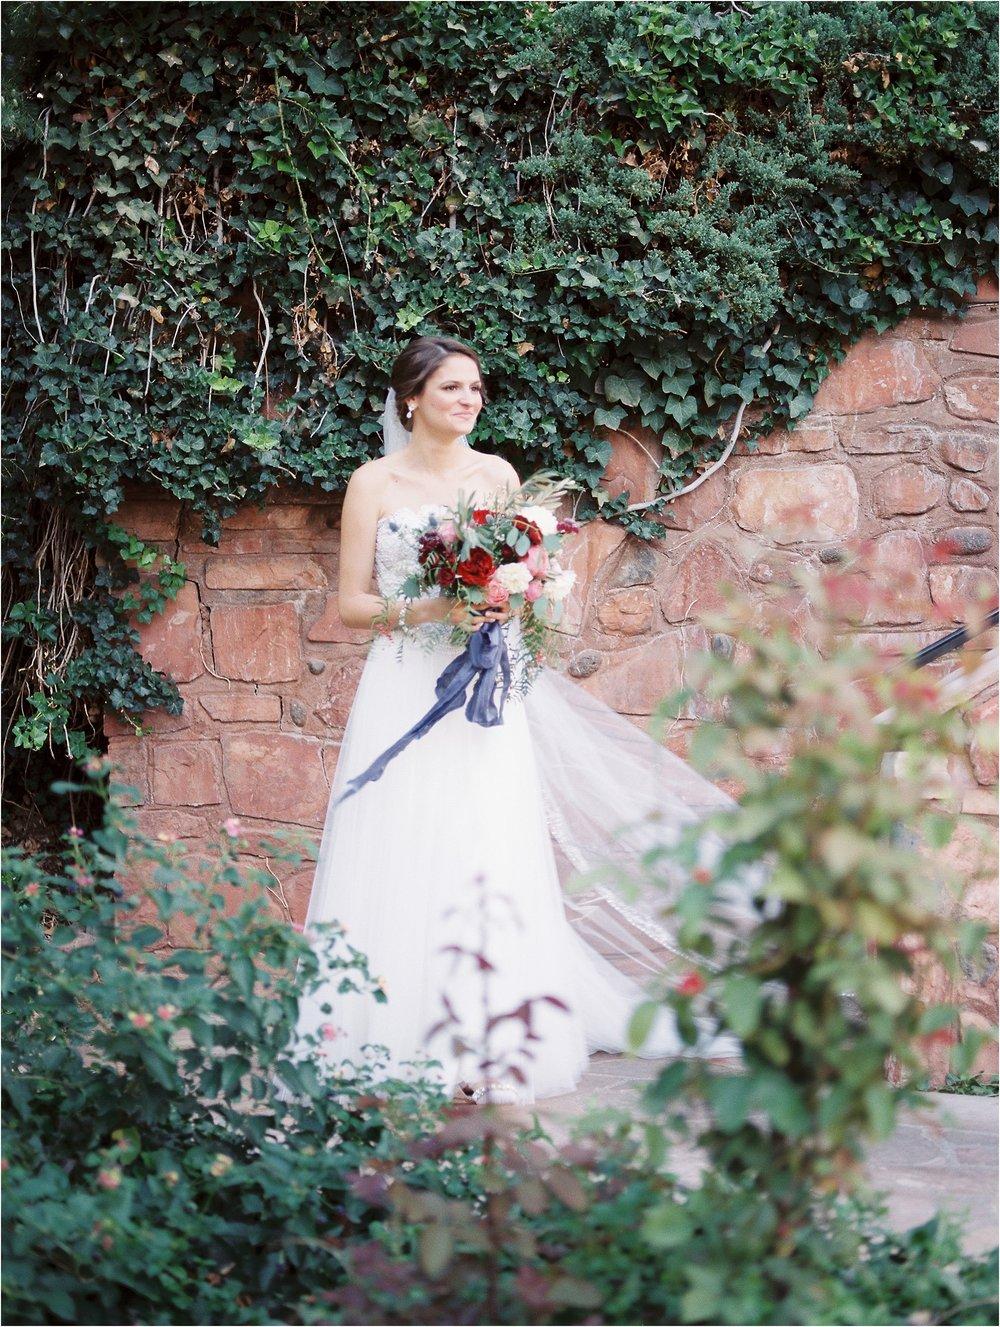 Sarah Jane Photography Film Hybrid Scottsdale Phoenix Arizona Destination Wedding Photographer sedona lauberge jon paige_0019.jpg